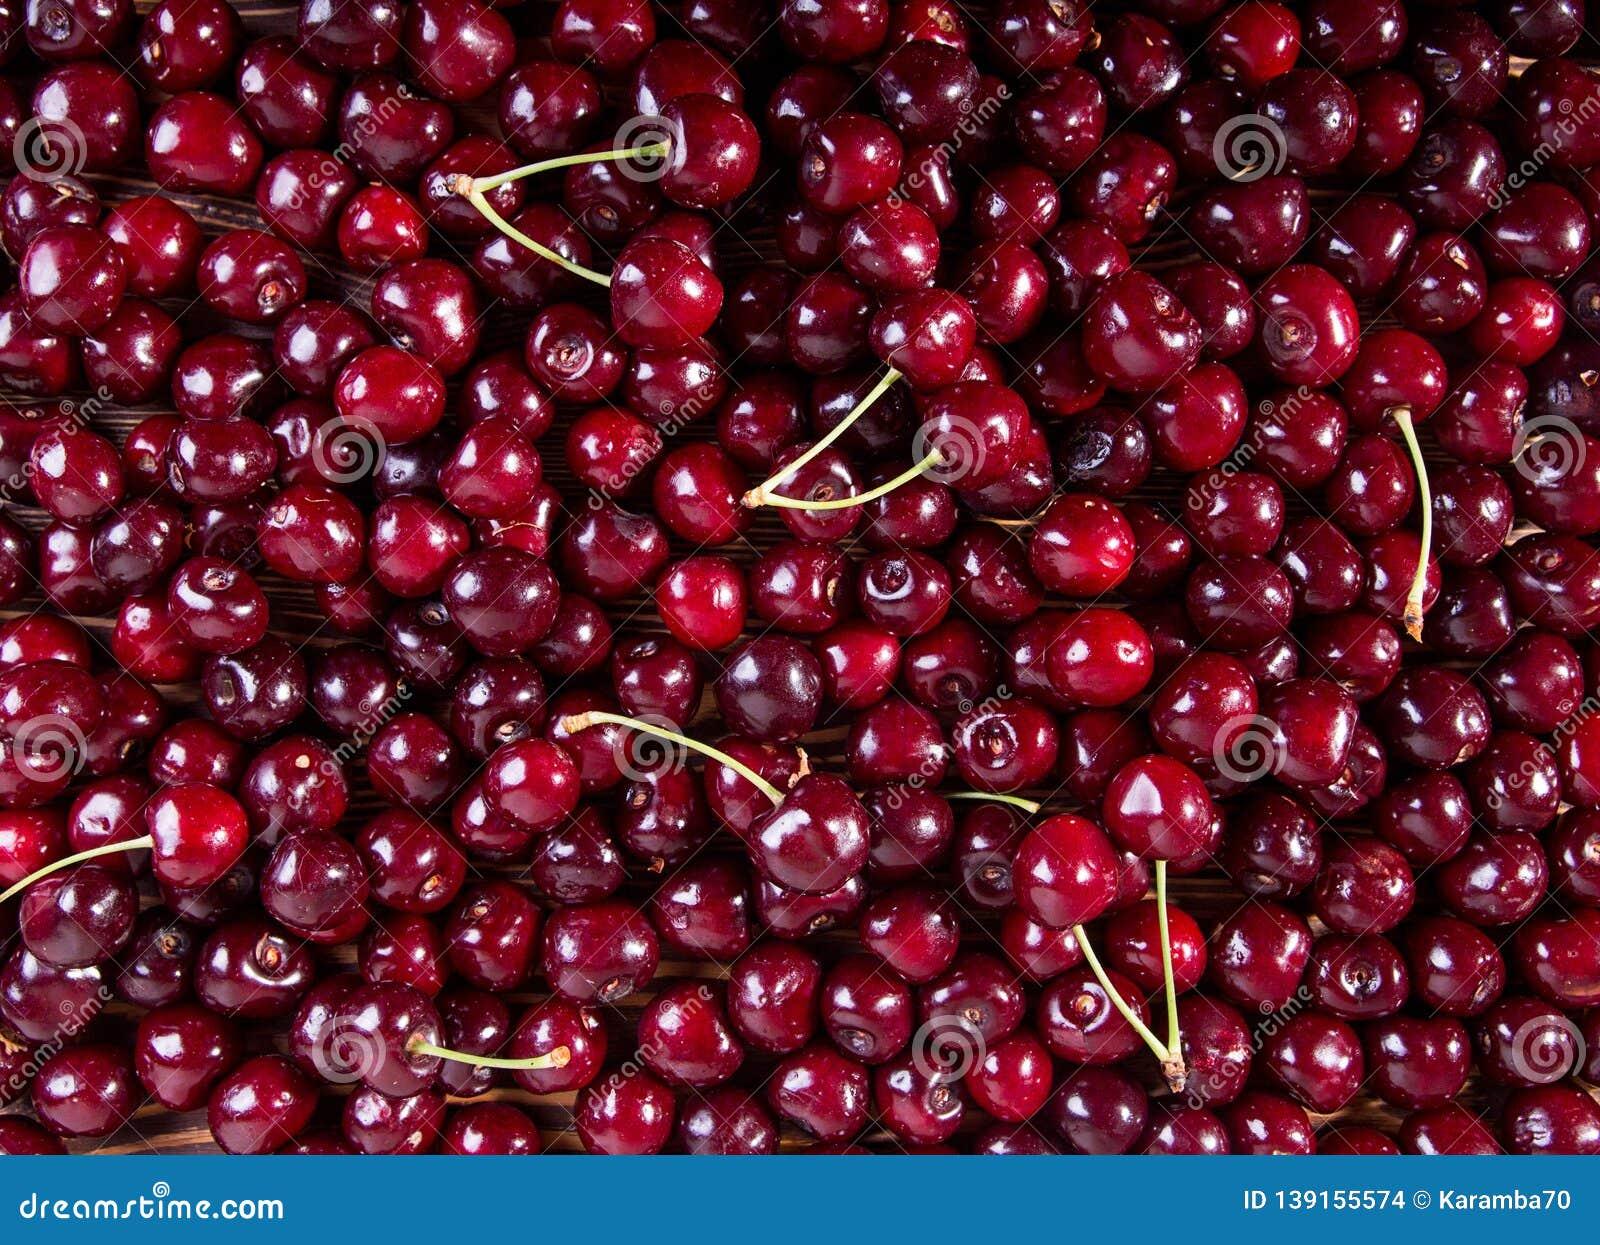 Fresh sweet cherry. Food background